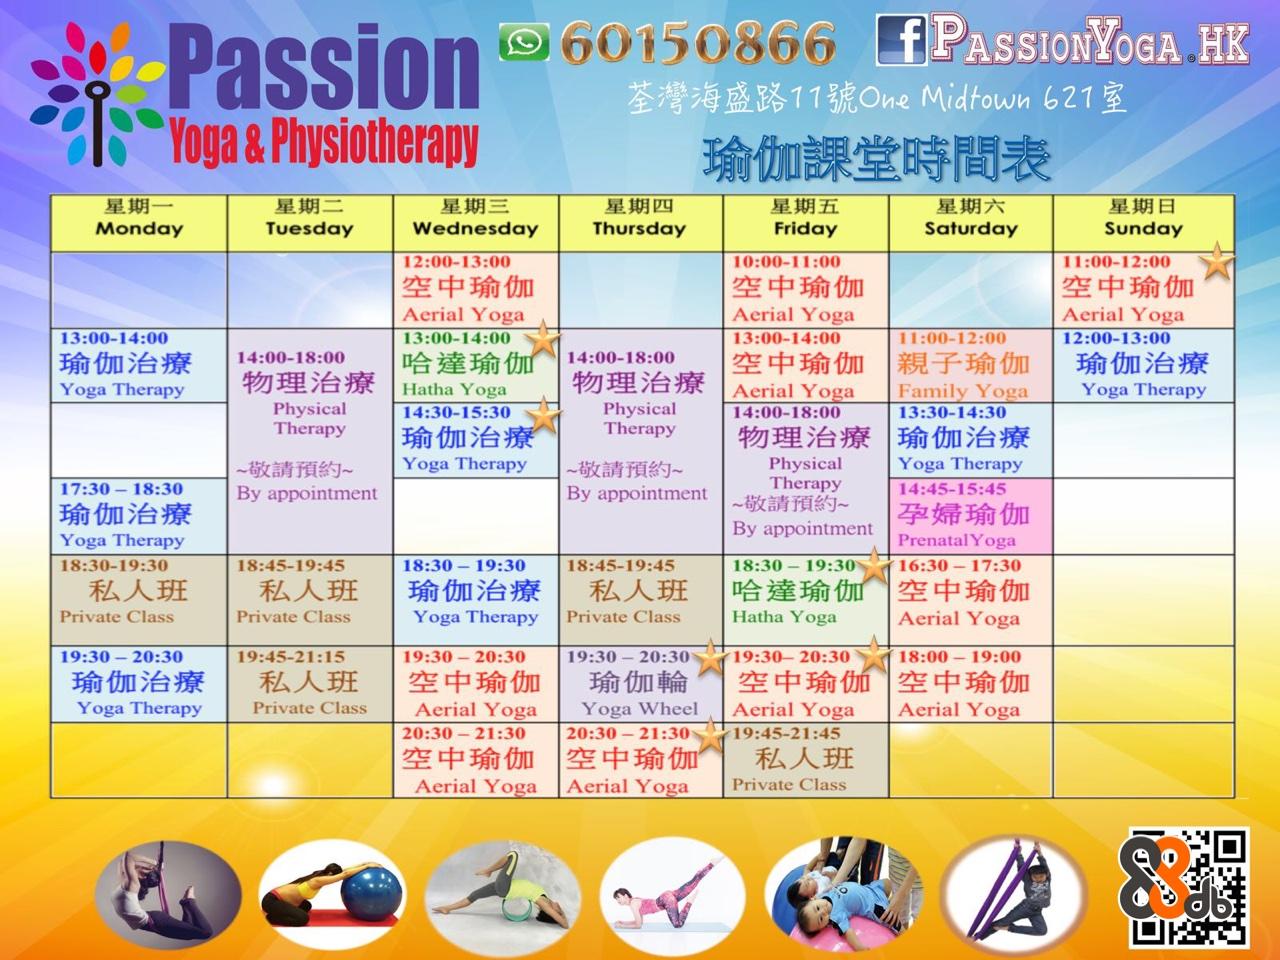 "Passion 60150866 fP alg ""Yoga& Physiotherapy 15086 荃灣海盛路11號One Midtown 621室 fPASSIONYOGA.HK 瑜伽課堂時間表 期 Tuesday Monday Wednesday Thursday Friday Saturday Sunday 12:00-13:00 10:00-11:00 空中瑜伽 Aerial Yoga 13:00-14:00 11:00-12:00 空中瑜伽 Aerial Yoga 12:00-13:00 空中瑜伽 Aerial Yoga 13:00-14:00 13:00-14:00 11:00-12:00 | |親子瑜伽 | 瑜伽治療 :00-18:00 空中瑜伽 14:00-18:00 哈達瑜伽 |物理治療 Physical 瑜伽治療 Yoga Therapy 物理治療1 Hatha Yoga 14:30-15:30 |ス 1 Aerial Yoga 14:00-18:00 Yoga Family Yoga 13:30-14:30 |瑜伽治 Therapy 療 Therapy |物理治療|瑜伽治療 Yoga Therapy-敬請預約- Physical By appointment 1 ~敬請預約~ |孕婦瑜伽 By appointment 敬請預g9- Yoga Therapy 14:45-15:45 17:30 18:30 By appoiniment 瑜伽治療 Yoga Therapy 18:30-19:30 Prenatal Yoga 18.45-19:45-18:30-19:30 18:45-19:45 16:30-17:30 私人班|私人班|瑜伽治療|私人班|哈達瑜伽 空中瑜伽 Private Class Private Class Yoga Therapy Private Class Hatha Yoga Aerial Yoga 19:30-20:30 19:45-21:15 19:30-20:30 19:30-20 19:30- 20:30 18:00 19:00 | 私人班|空中瑜伽| Private ClassAerial Yoga 瑜伽治療 瑜伽輪 空中瑜11 空中瑜伽 Yoga Therapy Yoga Wheel Aeri Font"